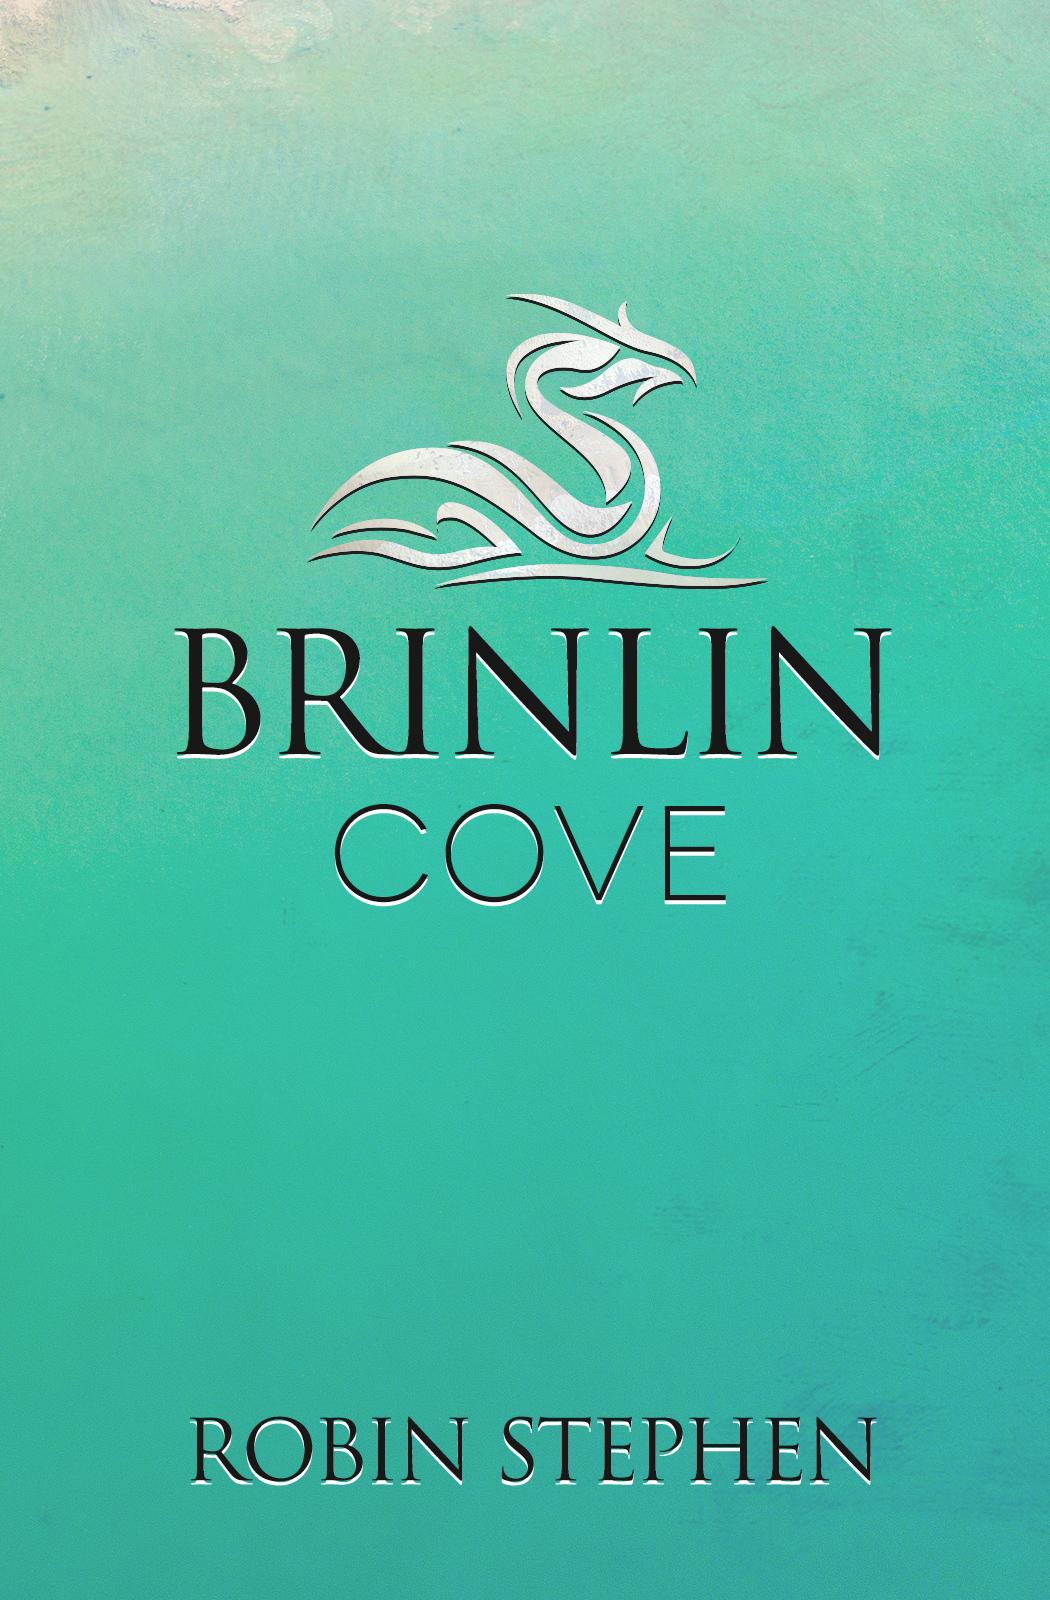 Brinlin Cove